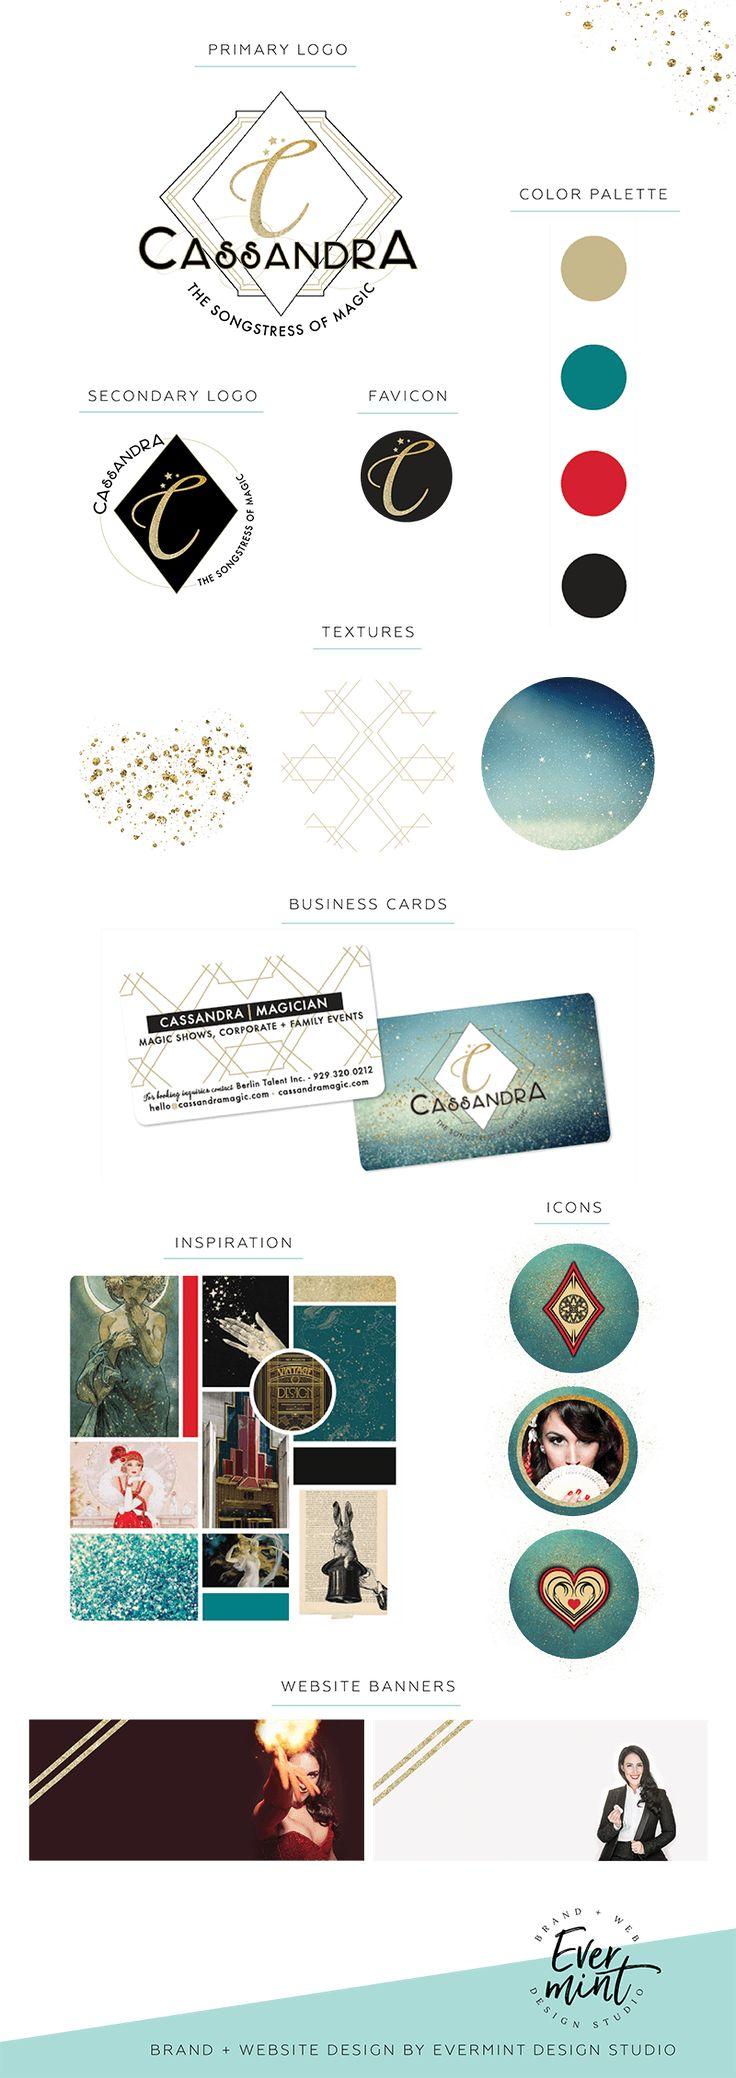 54 Best Evermint Design Studio Images On Pinterest Creative